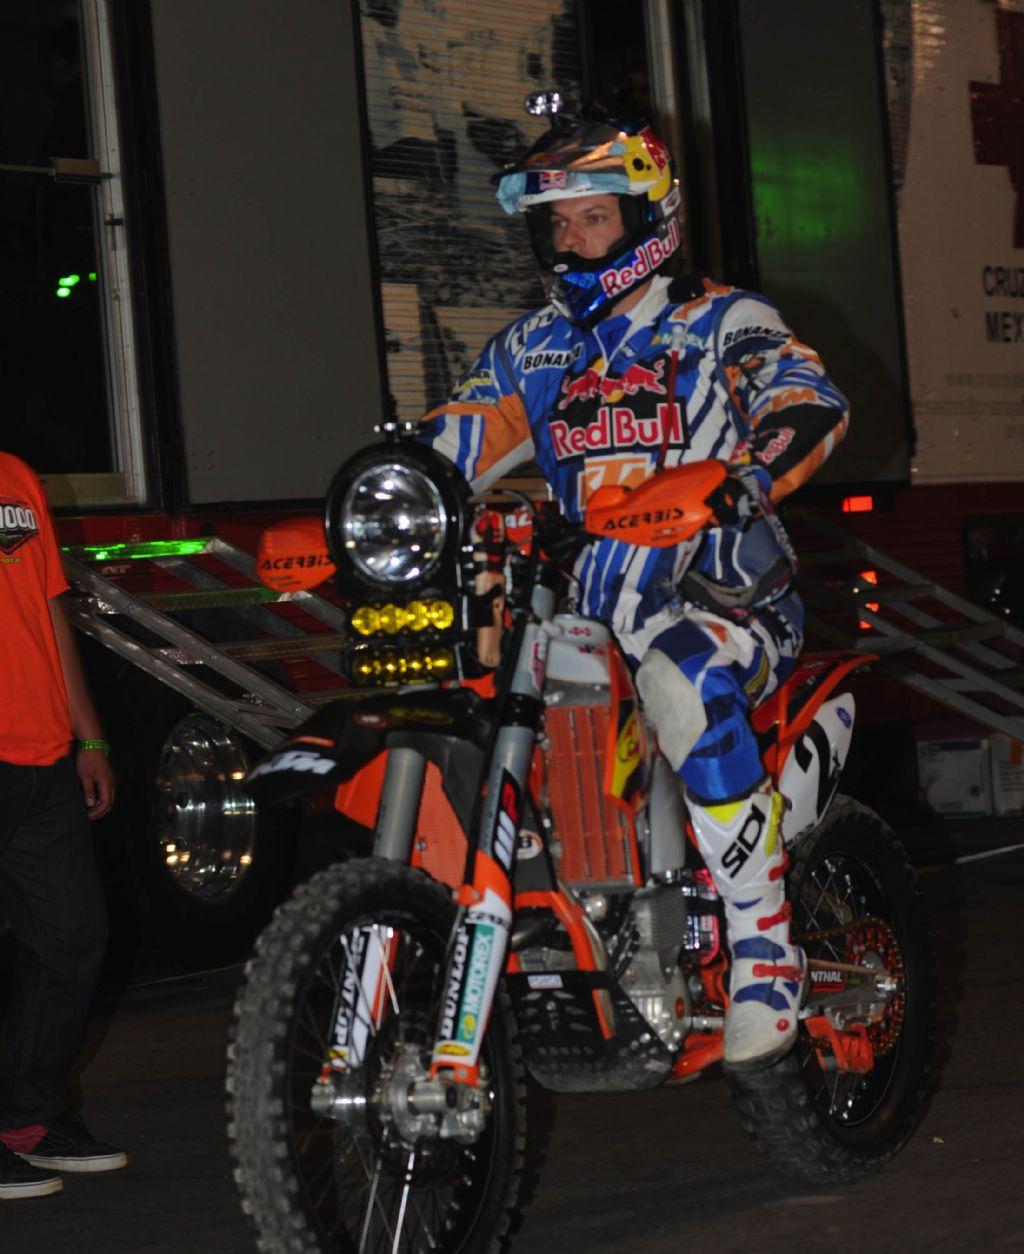 Gustavo Vildosola Jr. on Team's Strategy for 2013 SCORE Baja 1000 ...